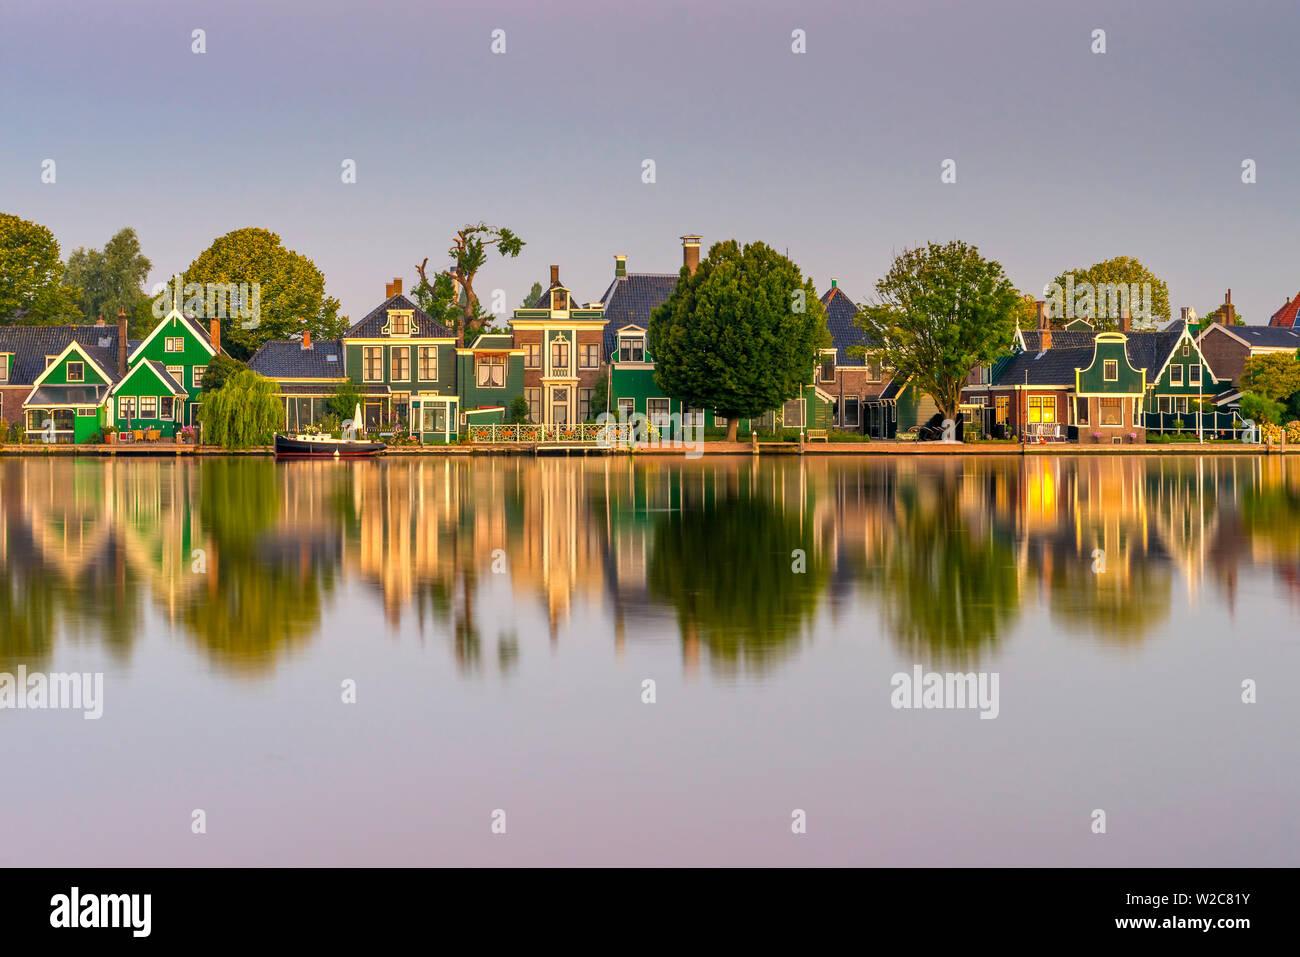 Netherlands, North Holland, Zaandam, River Zaan - Stock Image